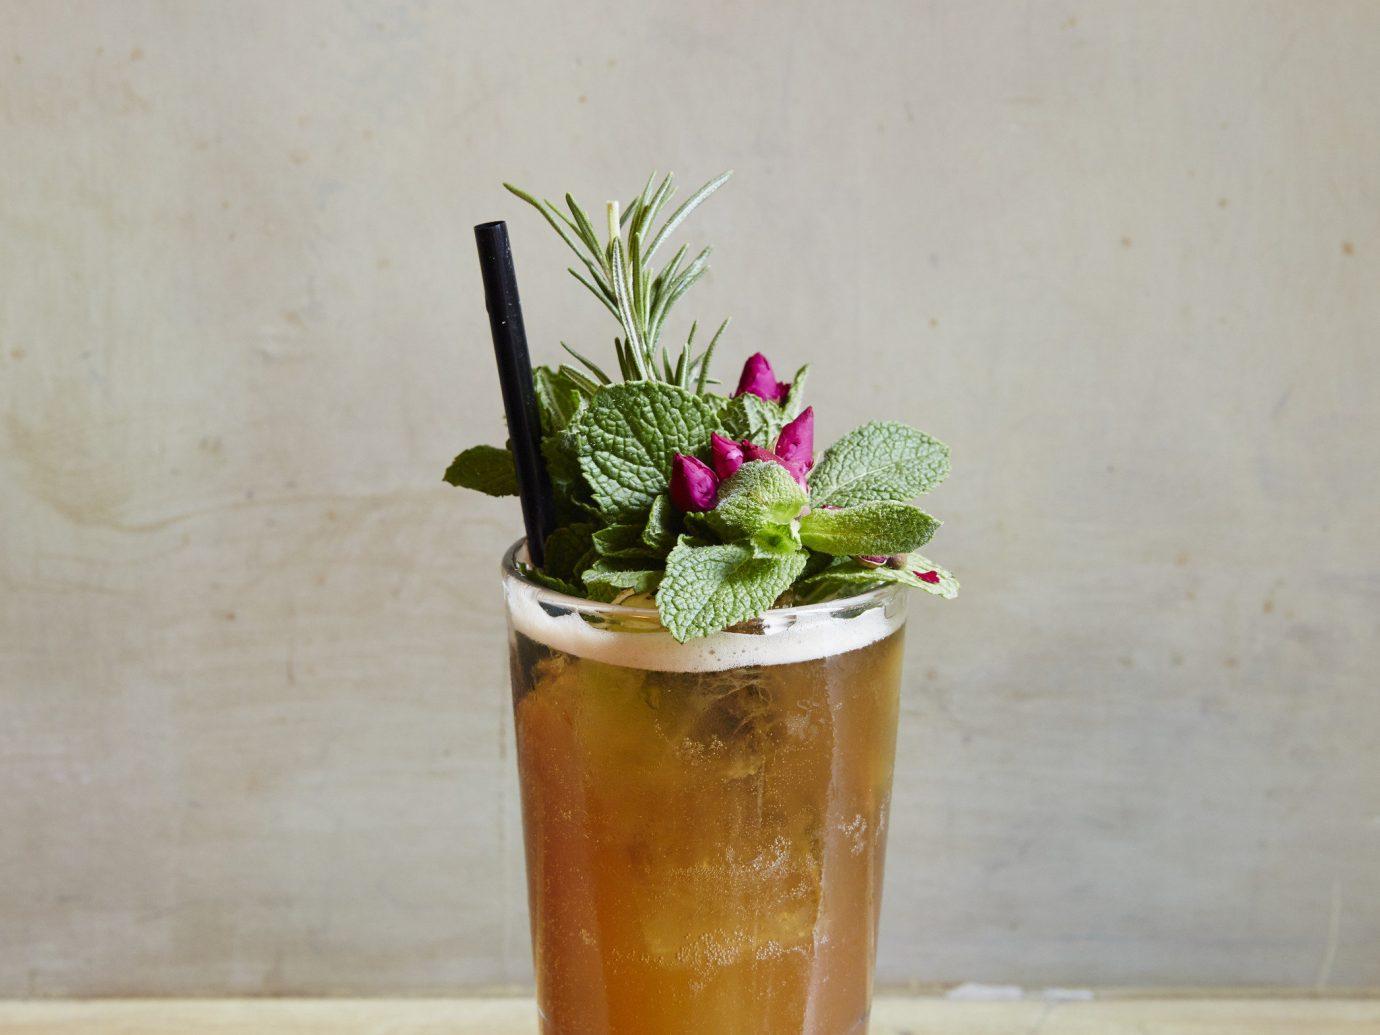 City Trip Ideas Weekend Getaways Drink plant flower mai tai non alcoholic beverage cocktail cocktail garnish mint julep juice long island iced tea flowerpot fresh